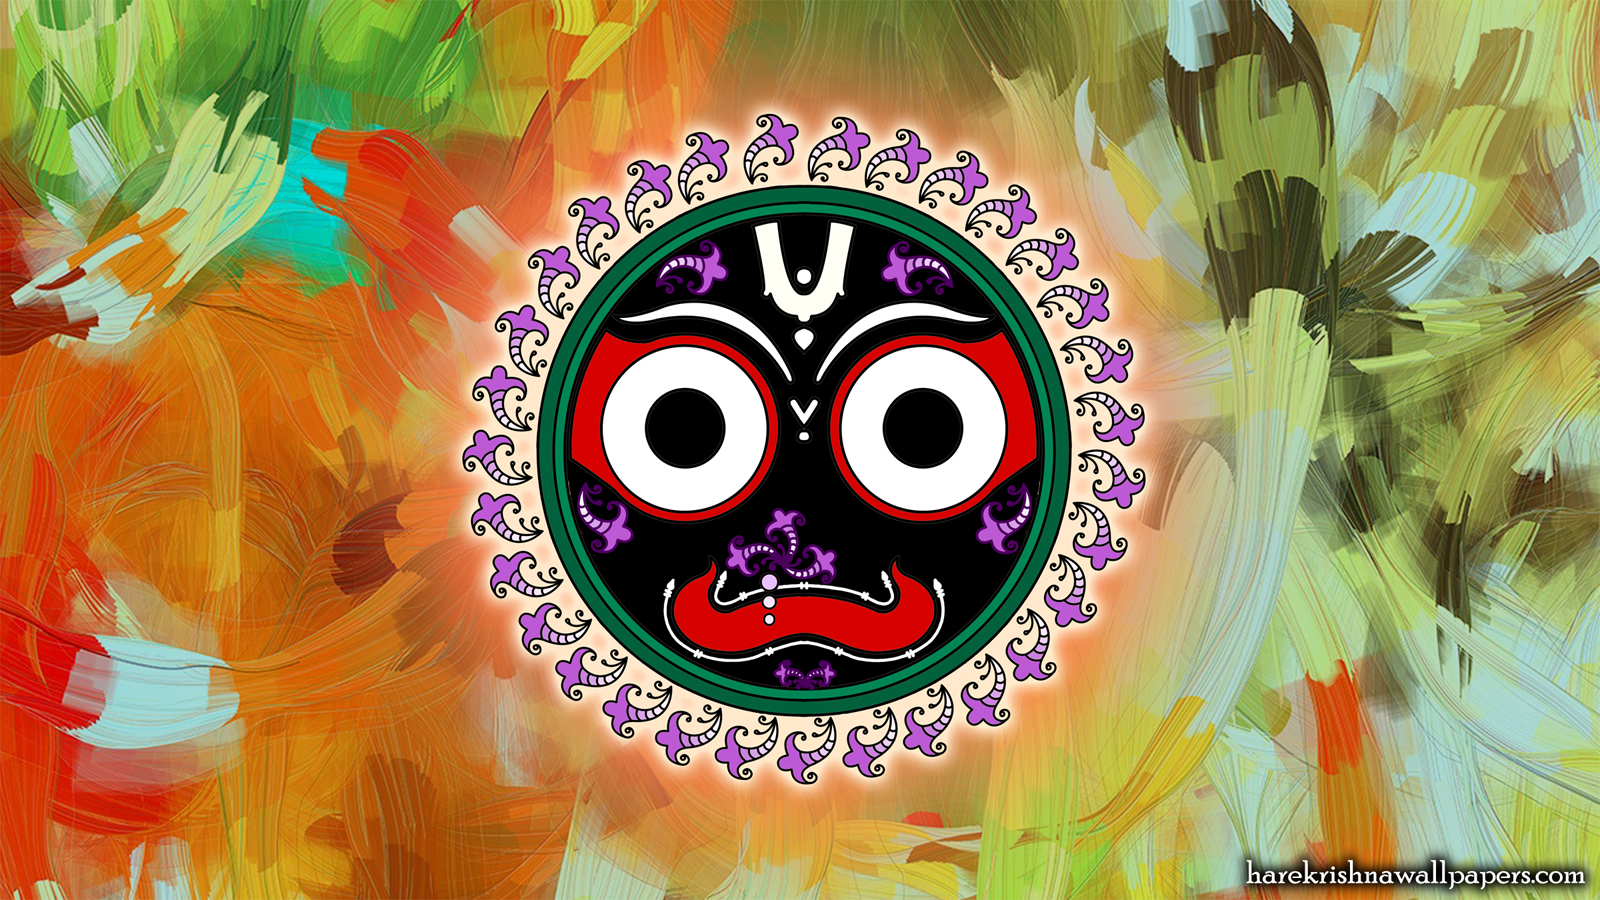 Jai Jagannath Wallpaper (017) Size 1600x900 Download